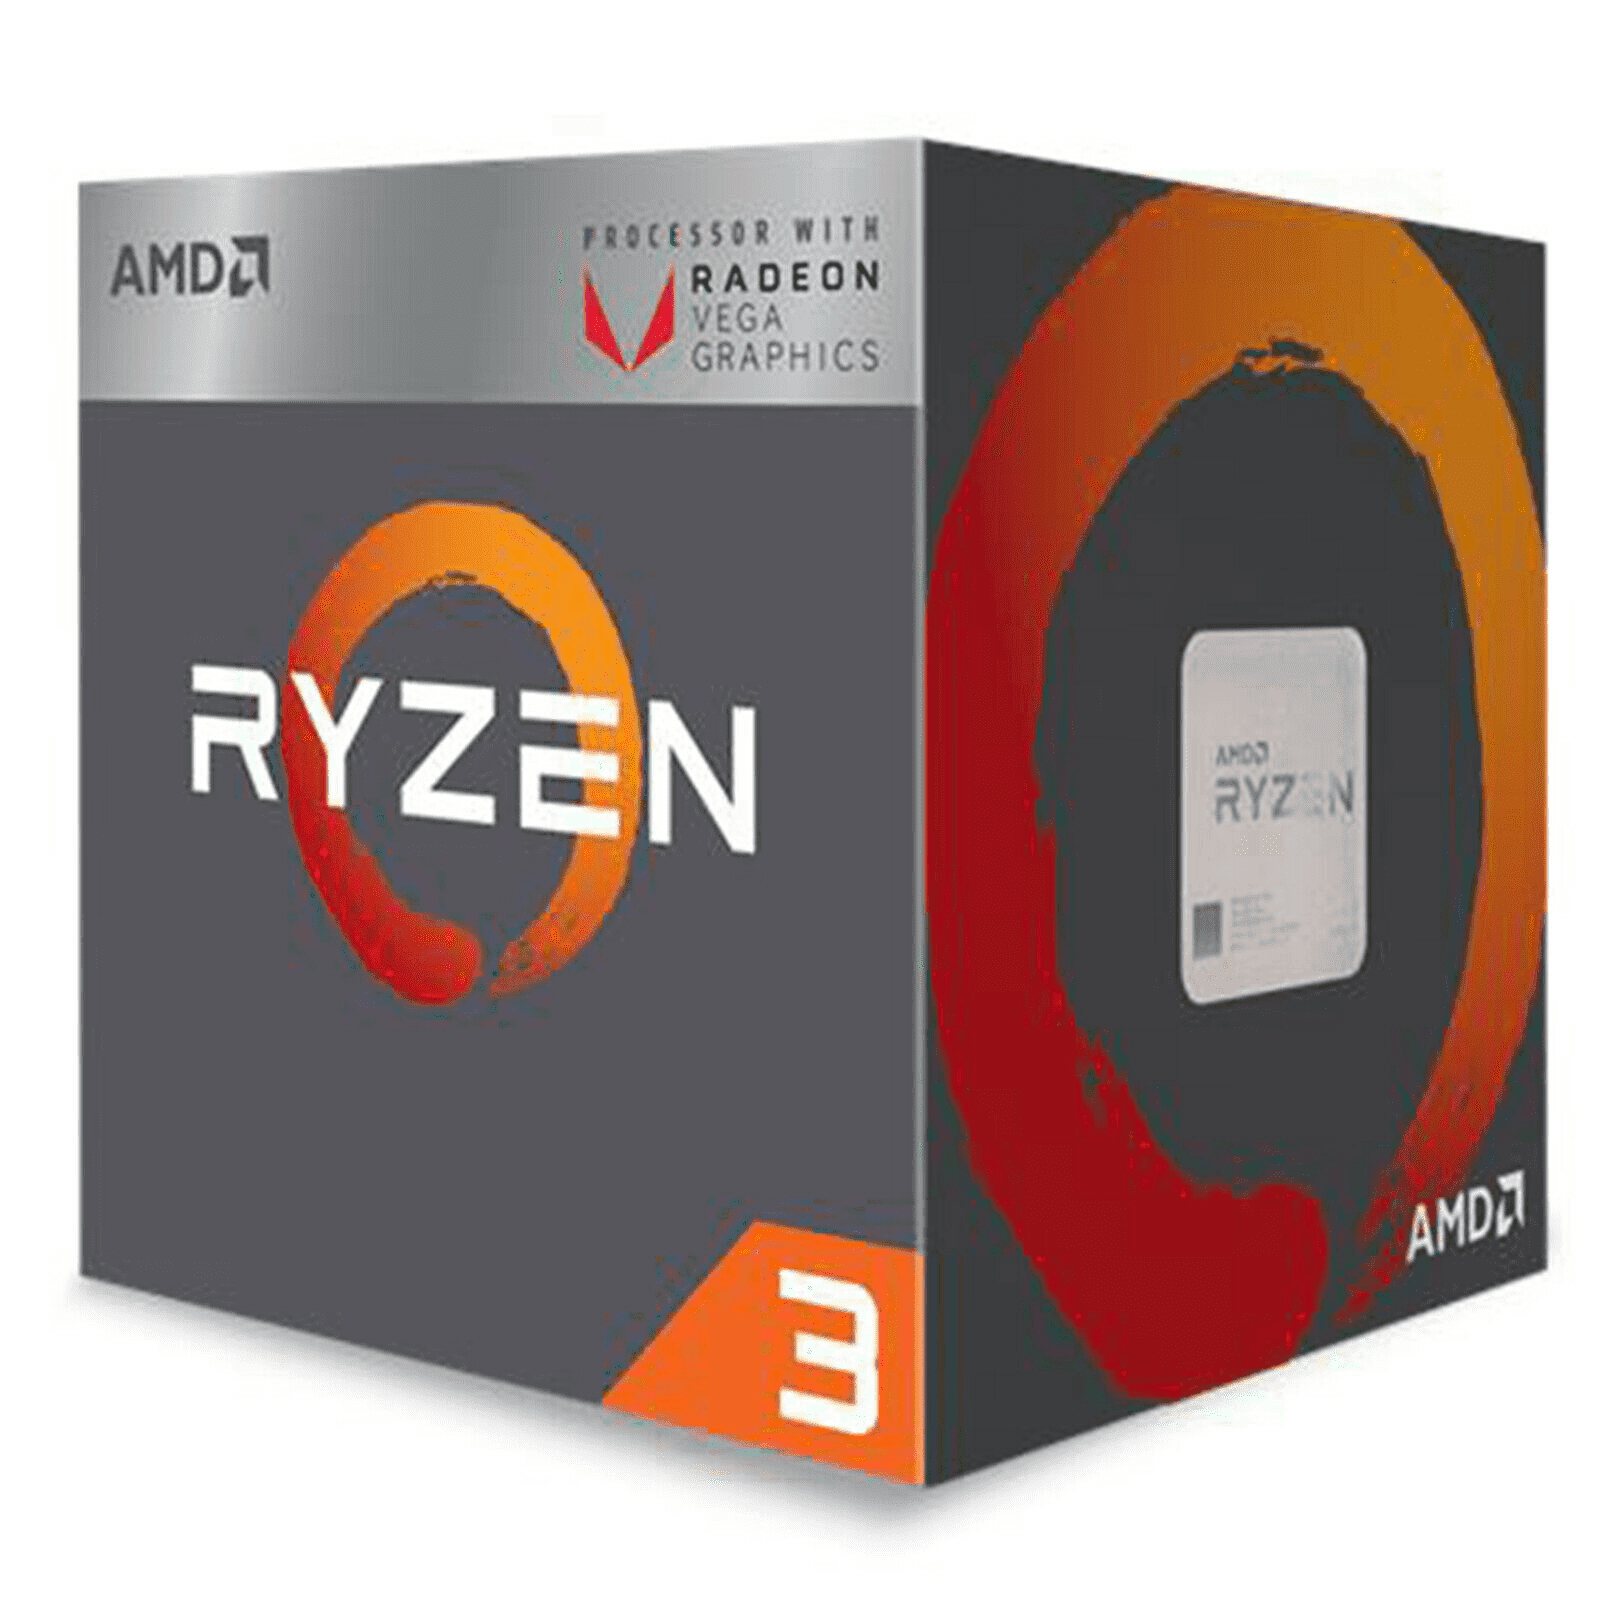 ADM CPU RYZEN 3 3,40GHZ AM4 10MB CACHE WRAITH STEALTH COOLER